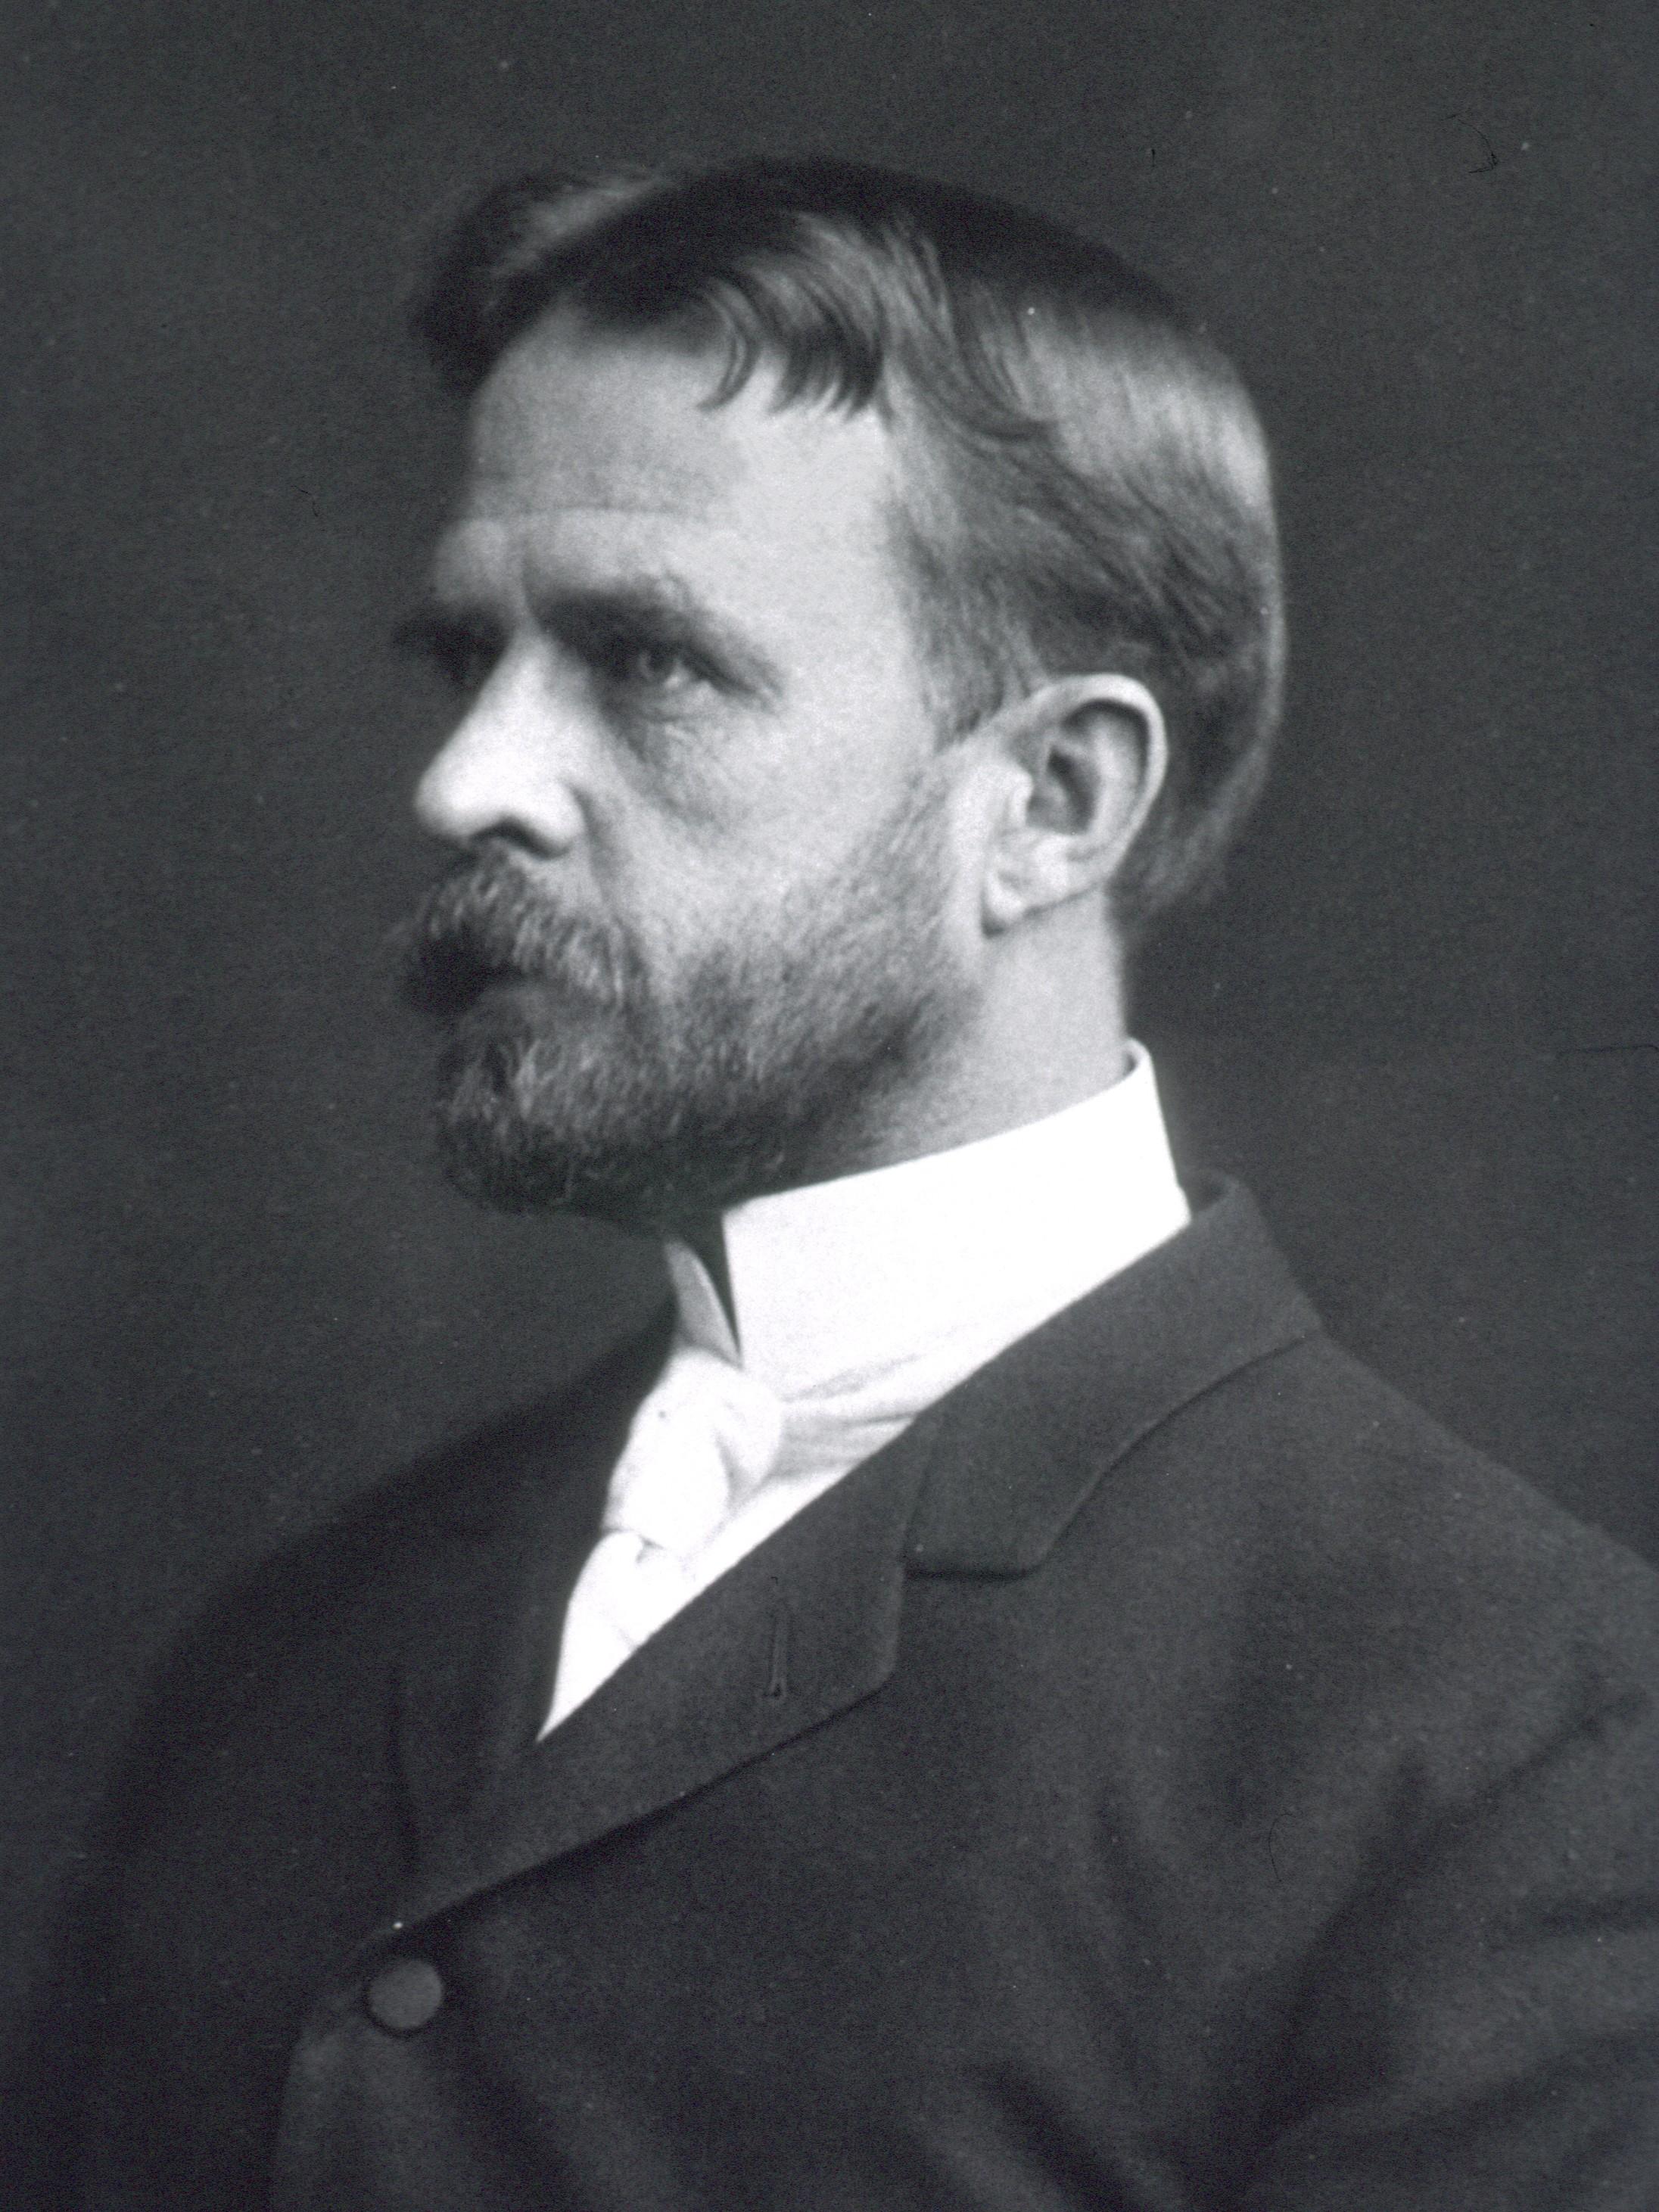 Depiction of Thomas Hunt Morgan